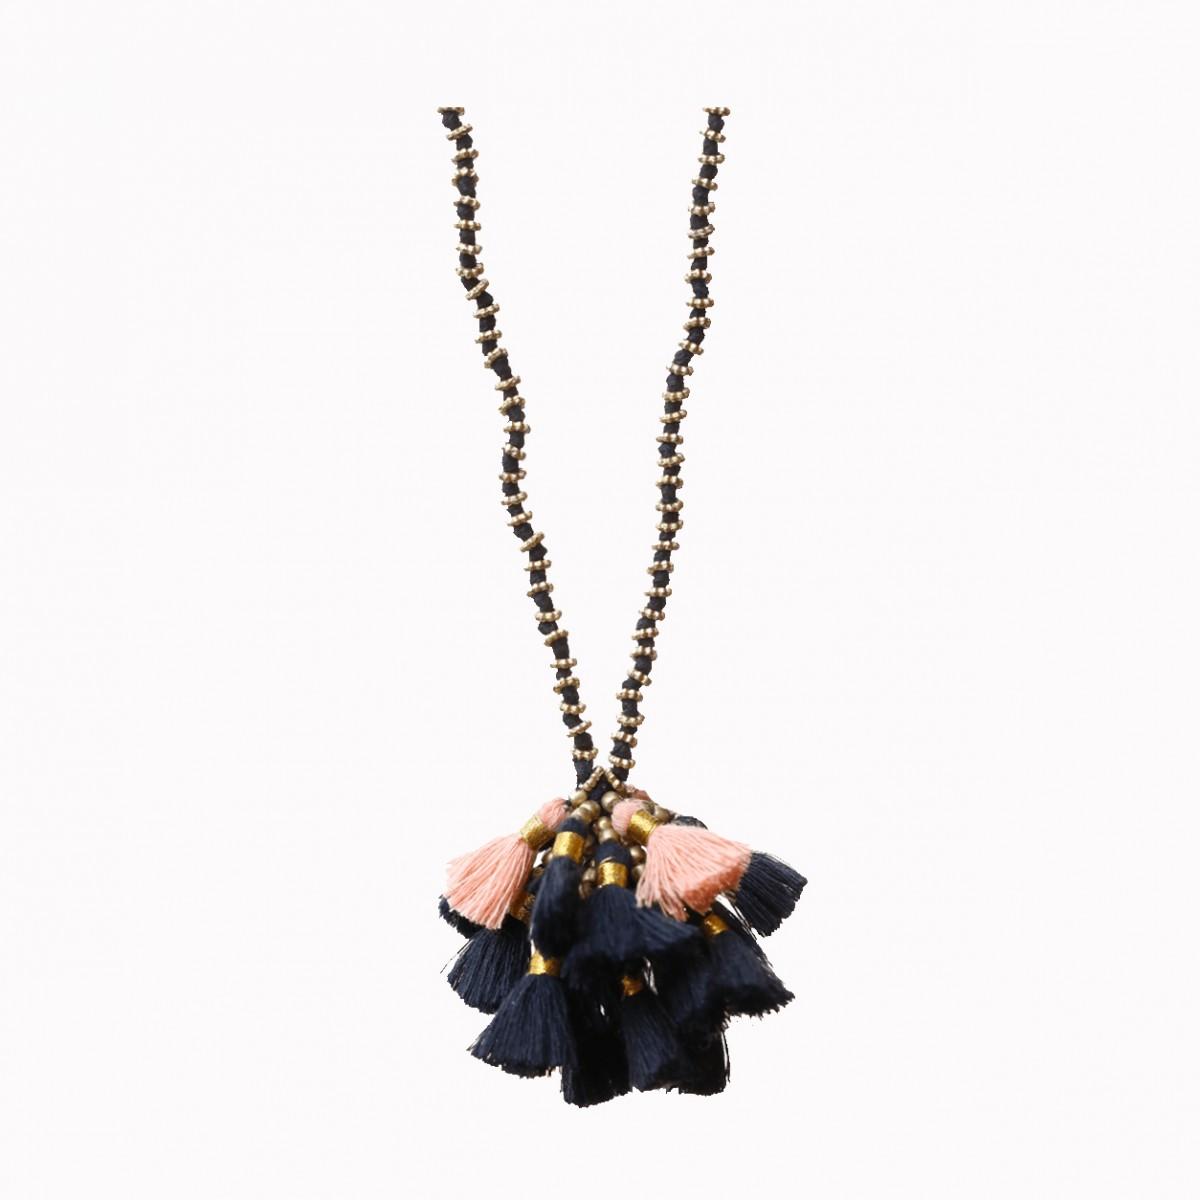 Tassels long black necklace